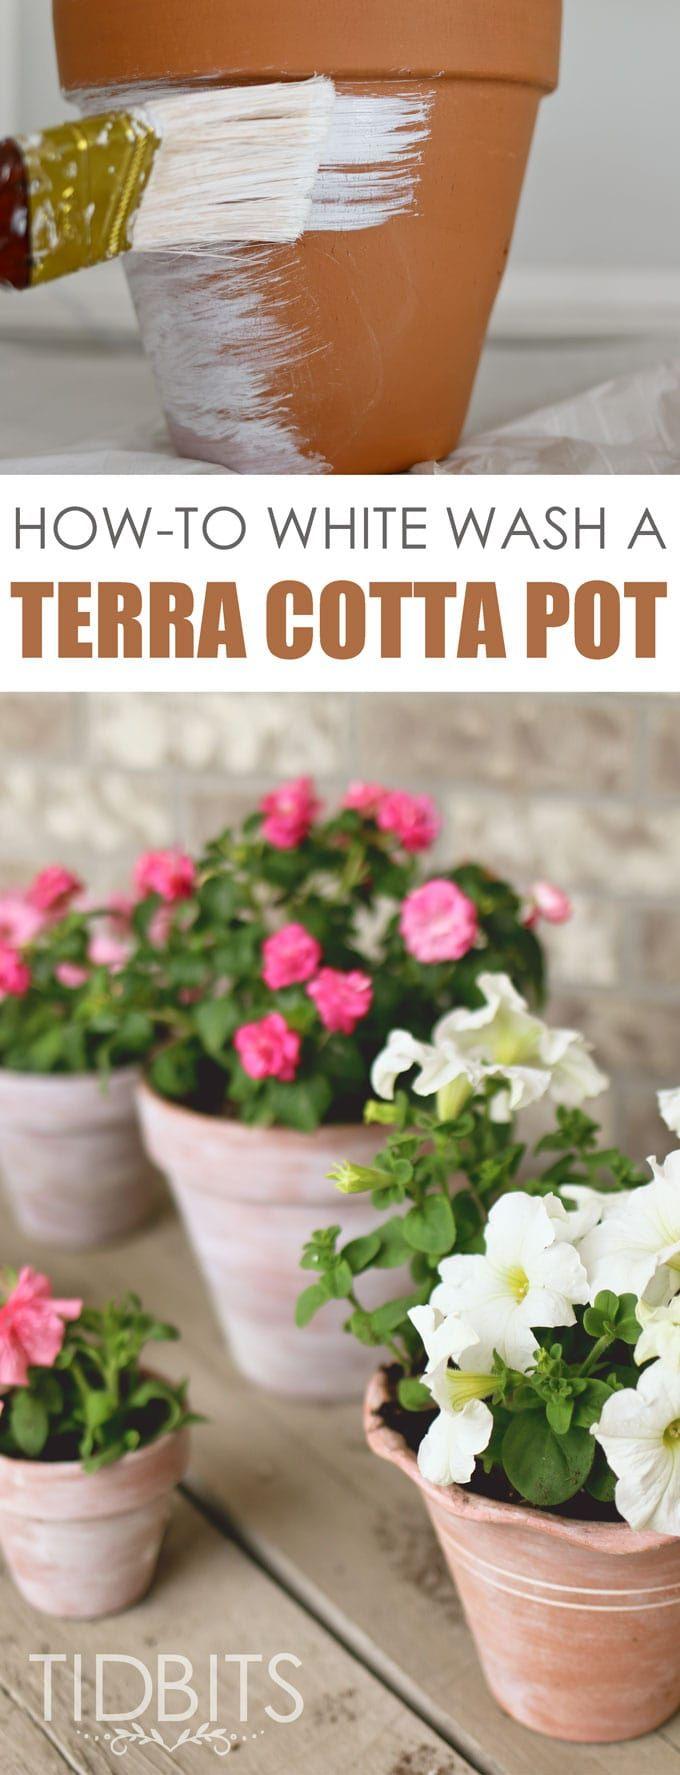 How To Whitewash Terra Cotta Pots Diy Tidbits Terracotta Flower Pots Diy Flower Pots Summer Front Porch Decor